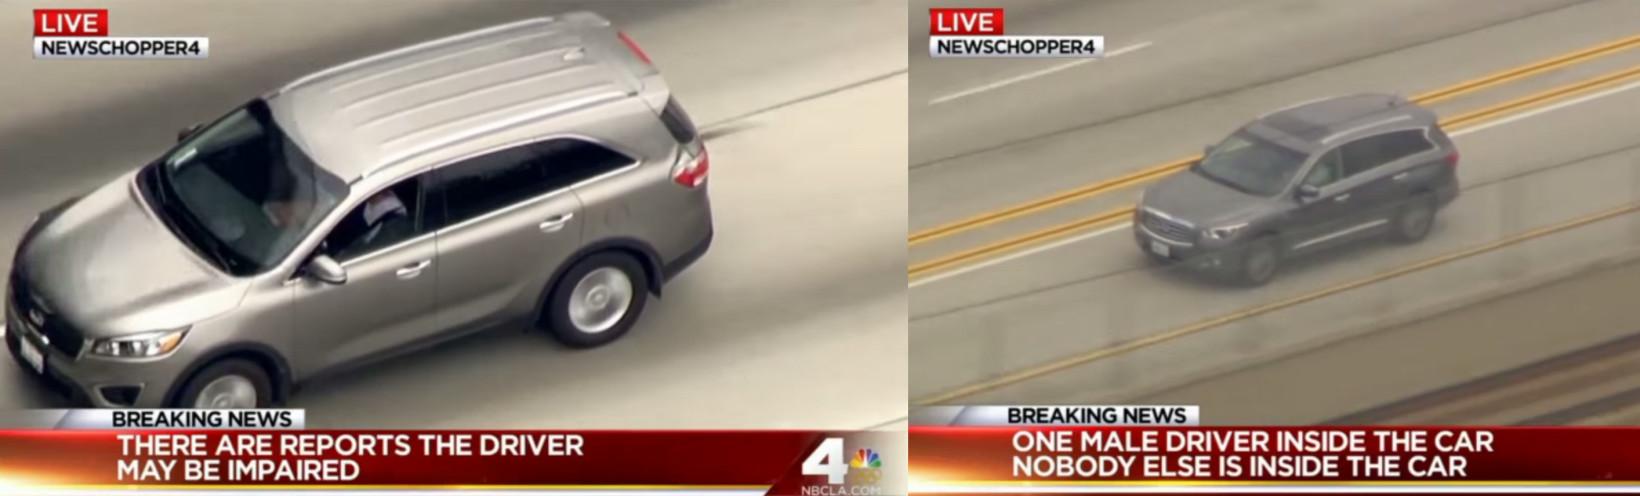 Left: Suspect car (no sunroof) | Right: Joe Schmo's car with sunroof